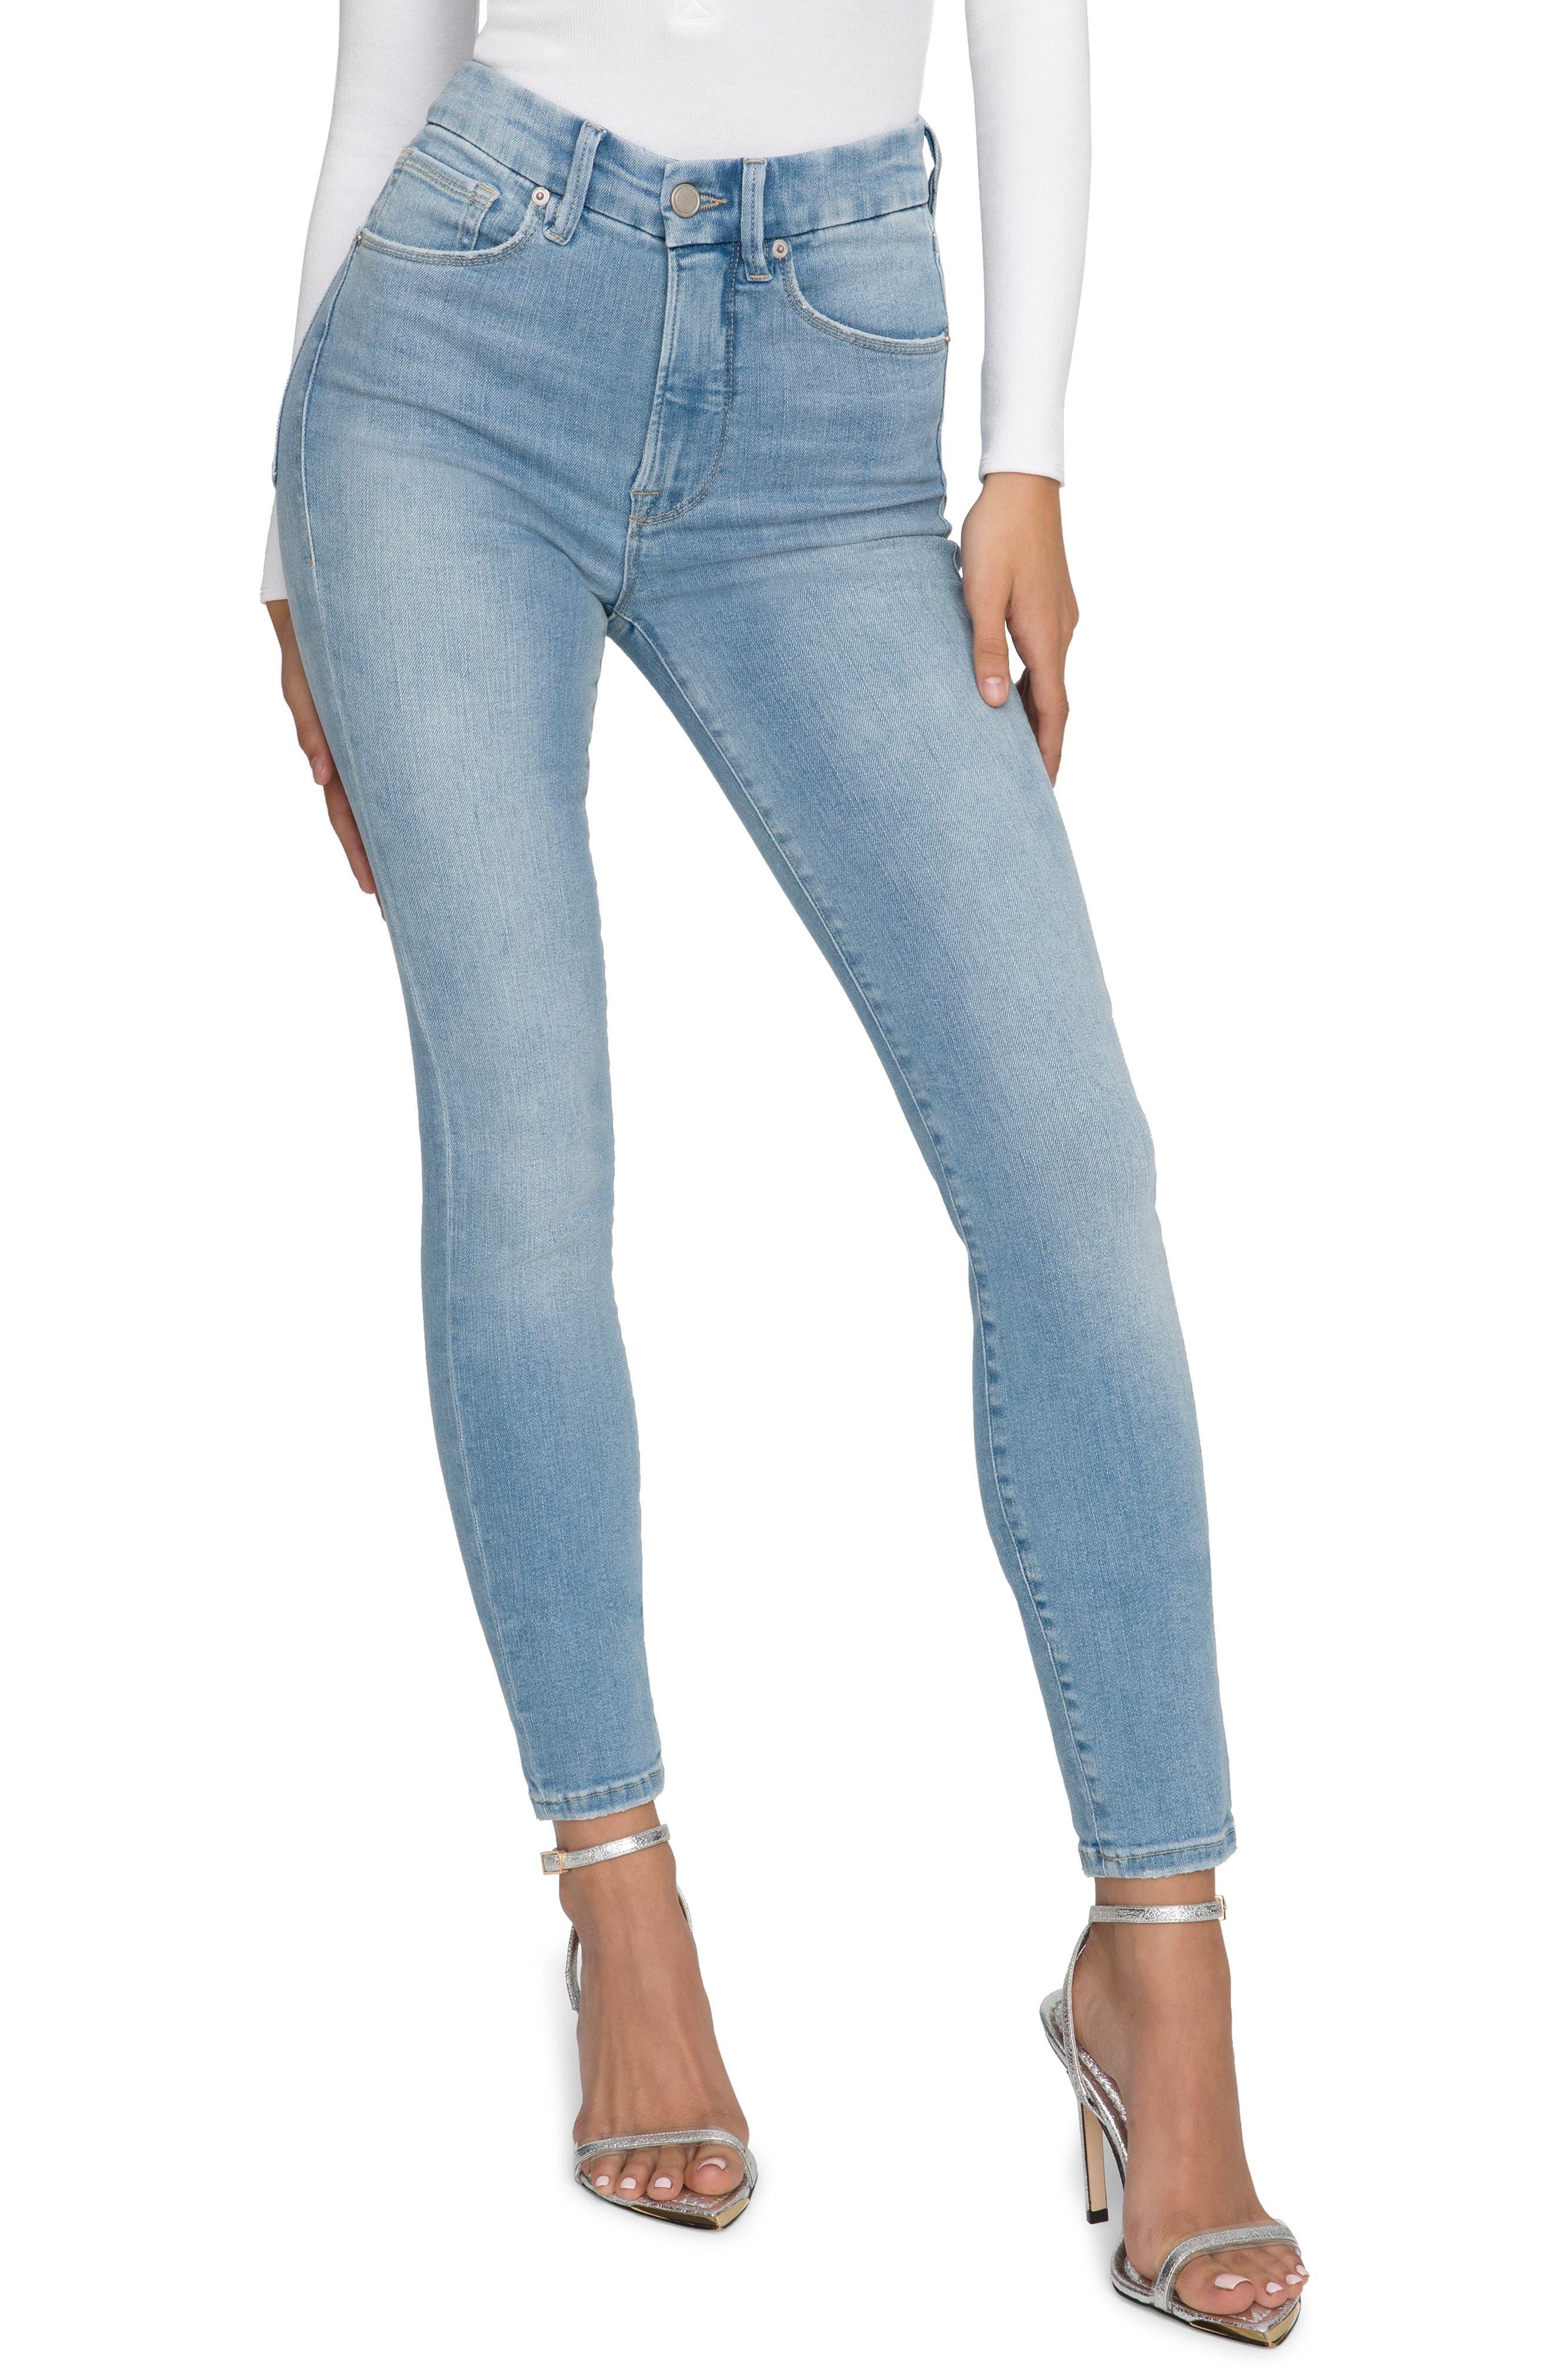 Women's Good American Good Waist High Waist Skinny Jeans